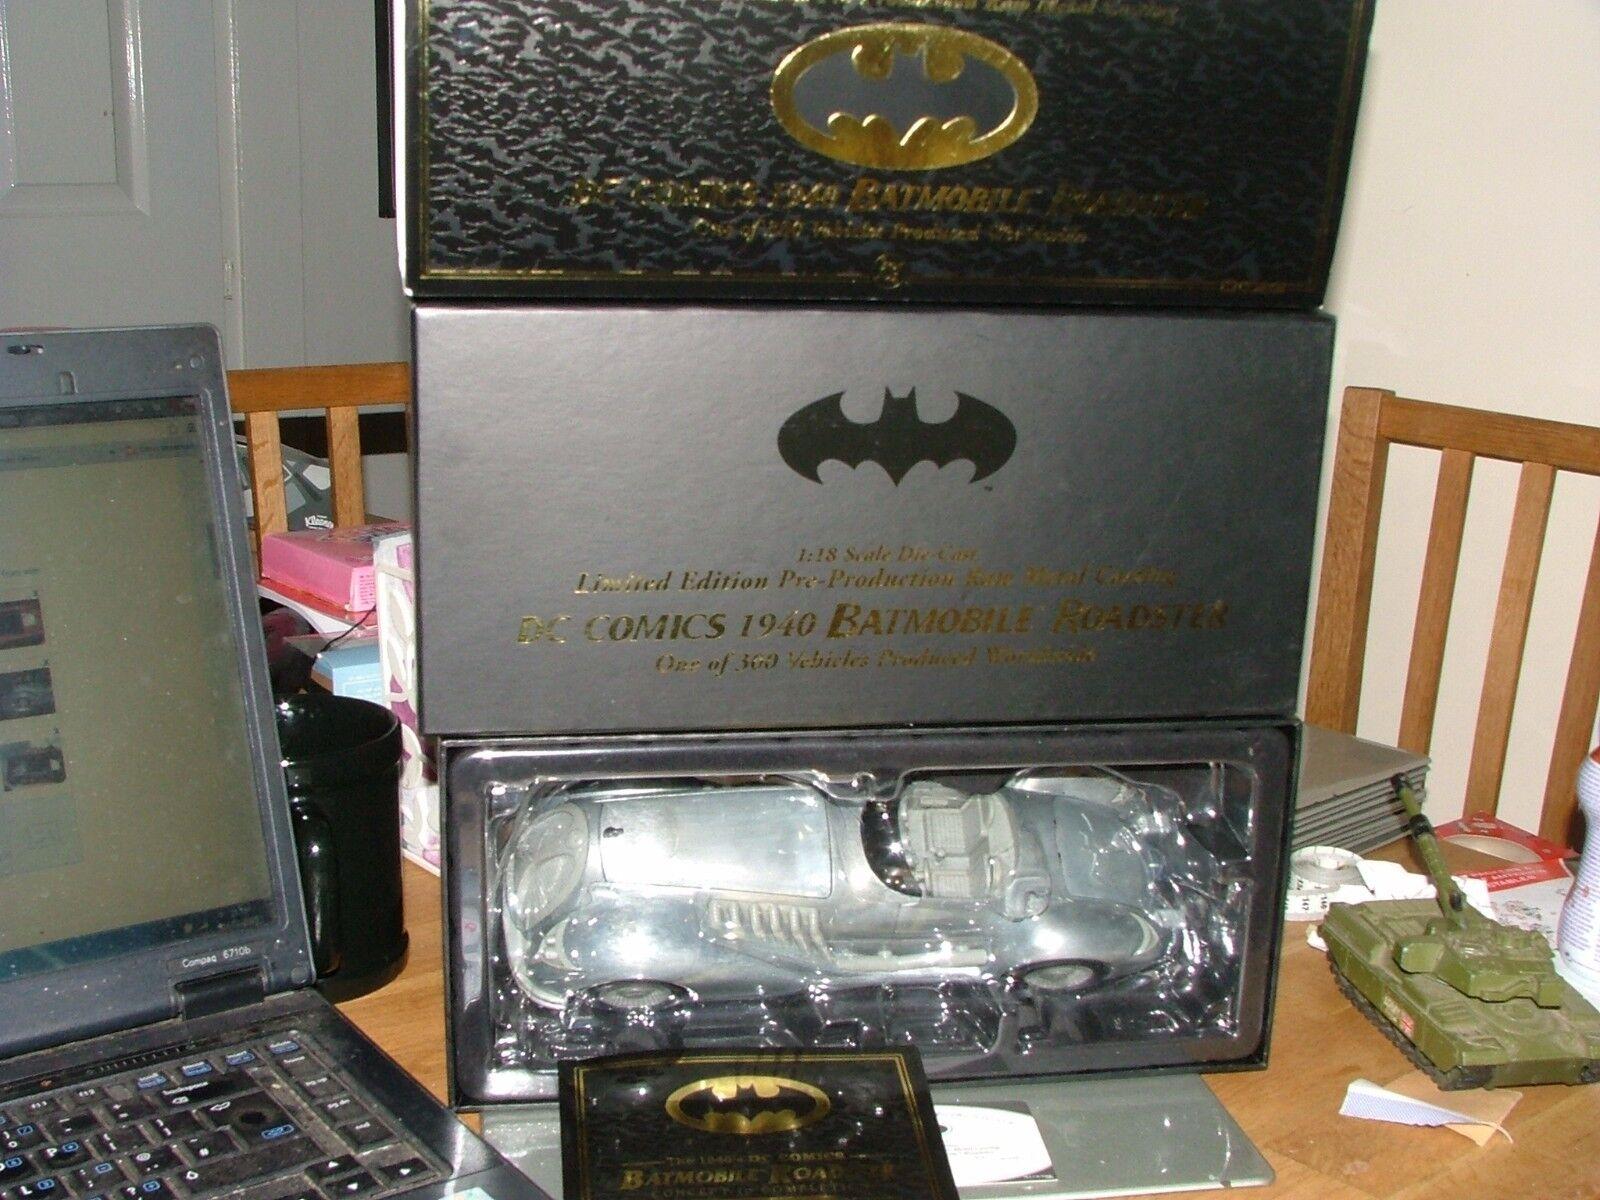 Corgi us77609 dc comics 1940 batman batmobile pre-production 300 worldwide mint